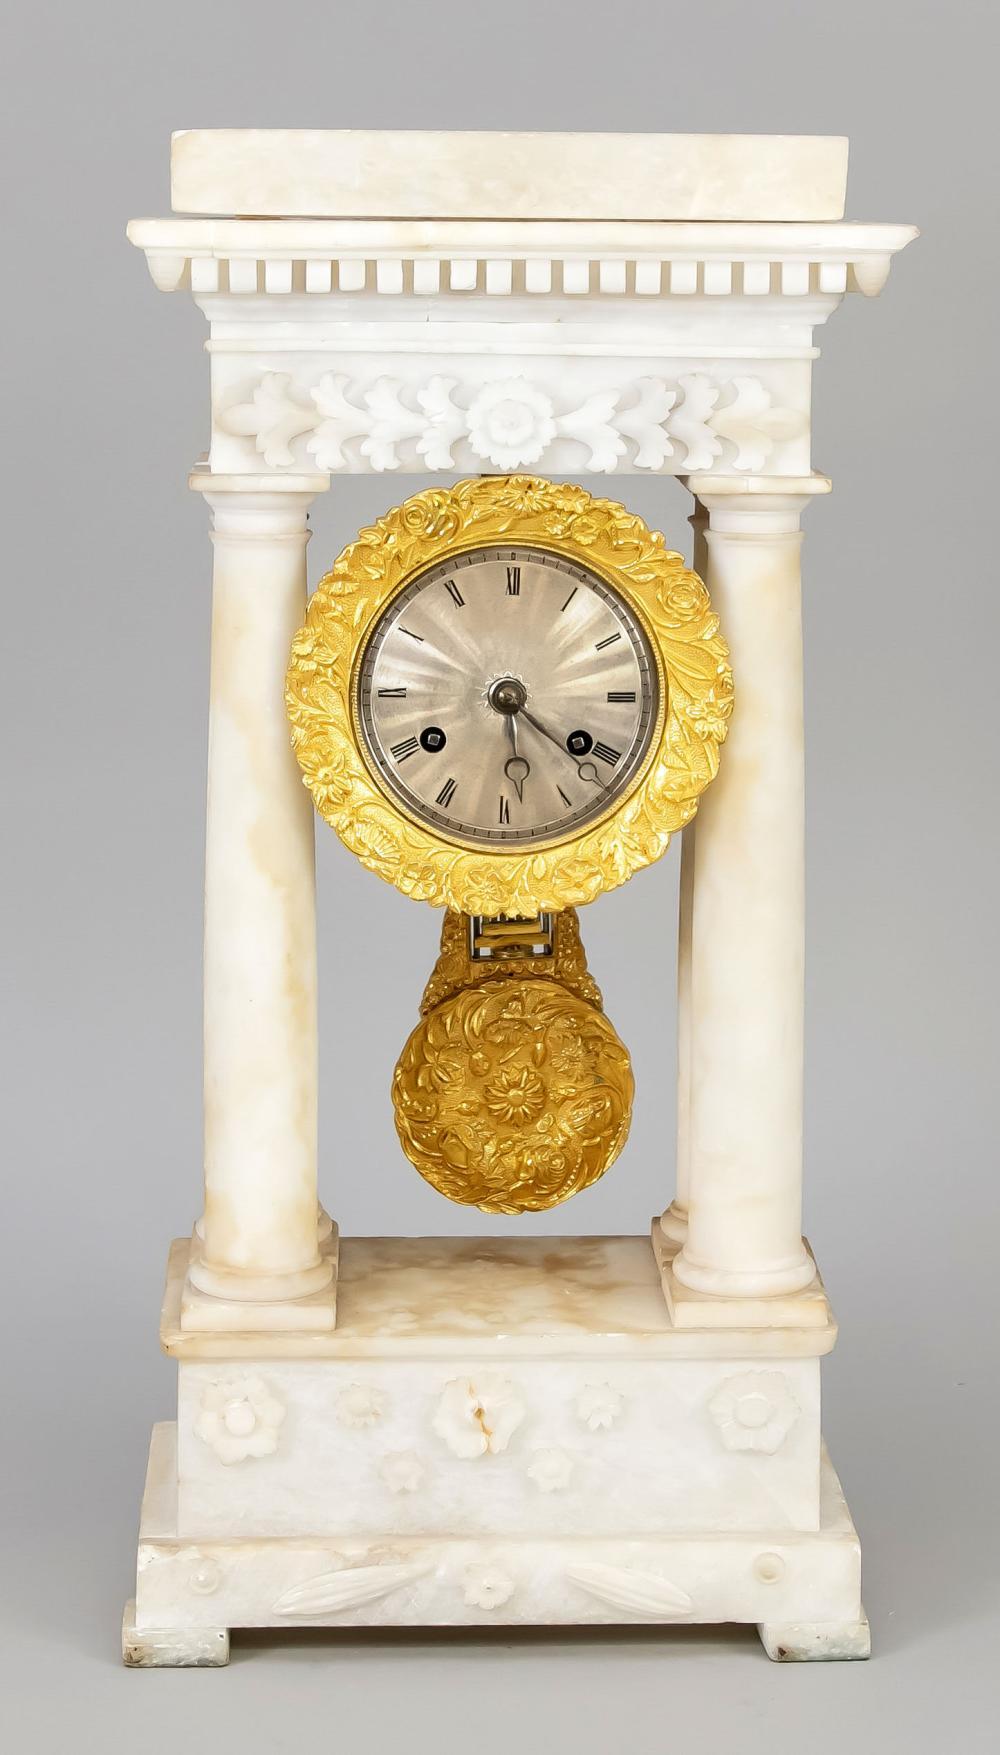 Portal clock 2nd half of the 1